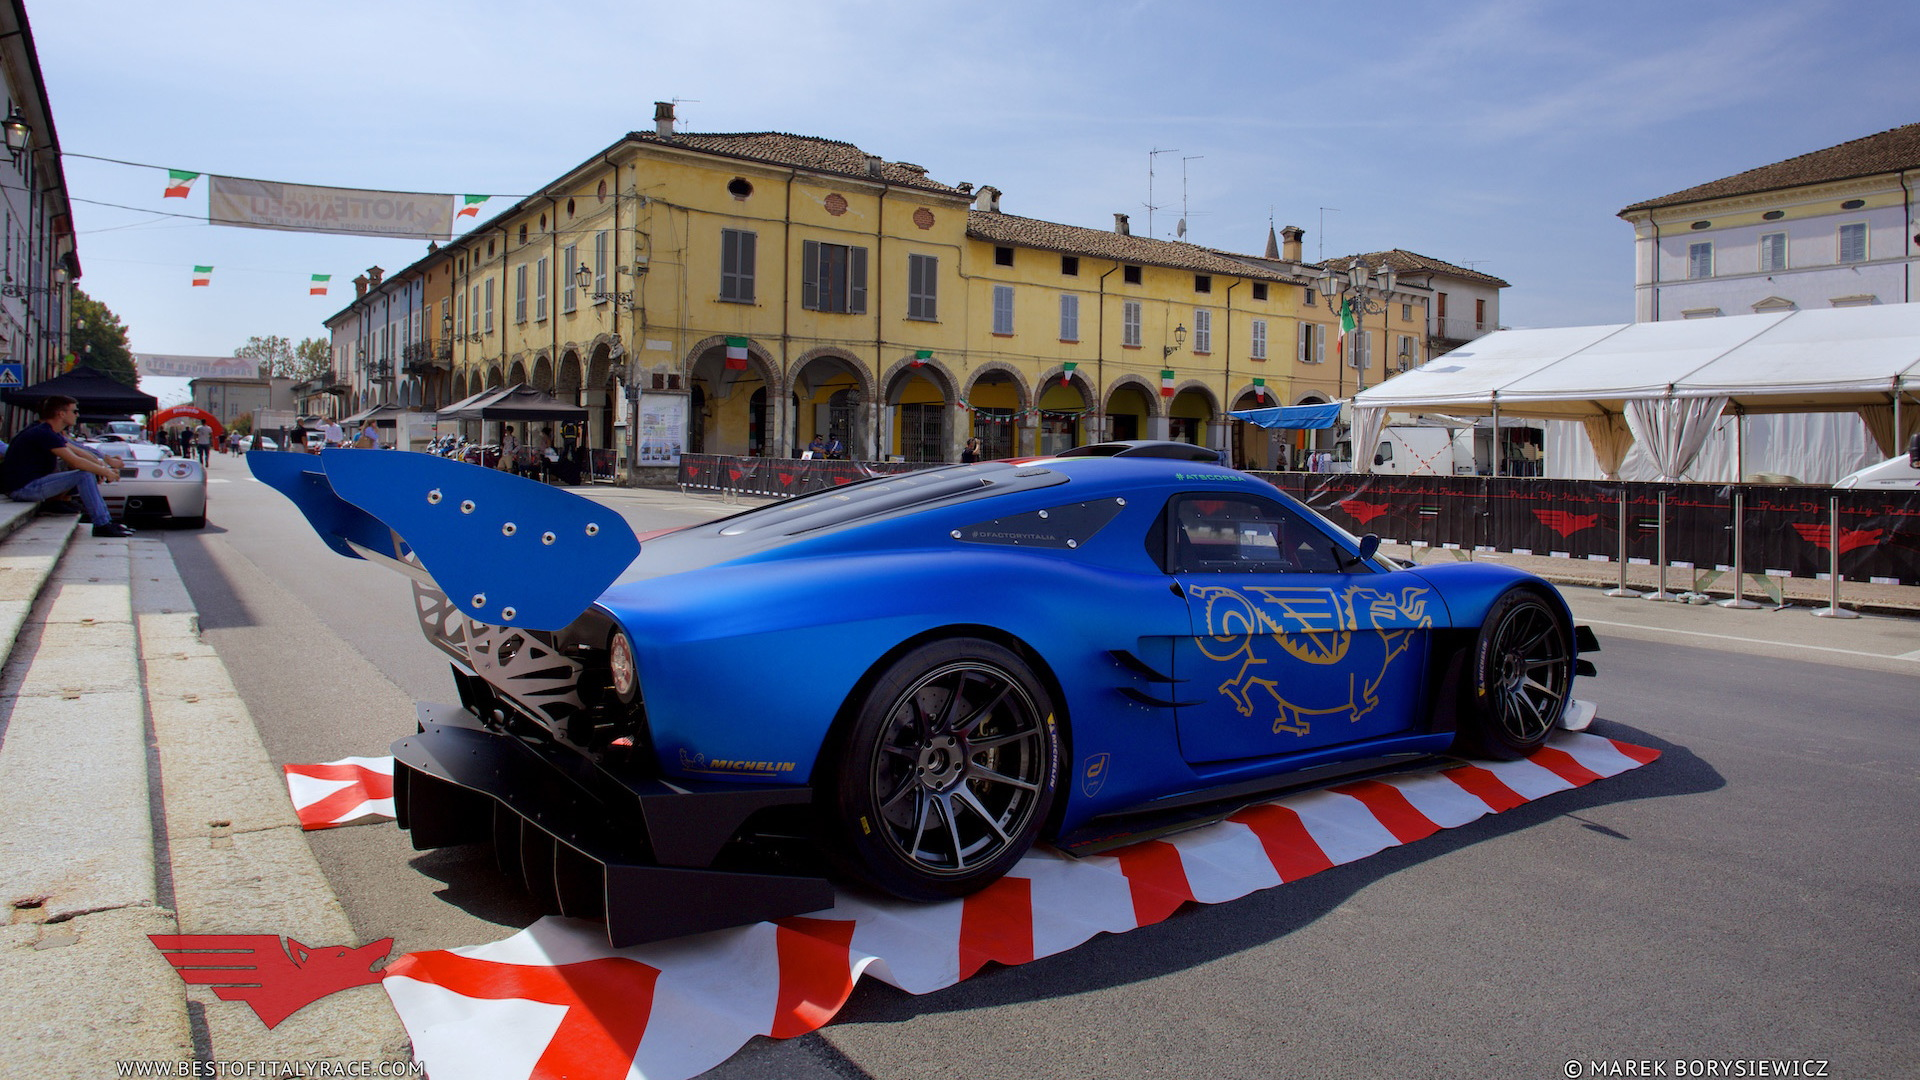 2020 ATS RR Turbo race car